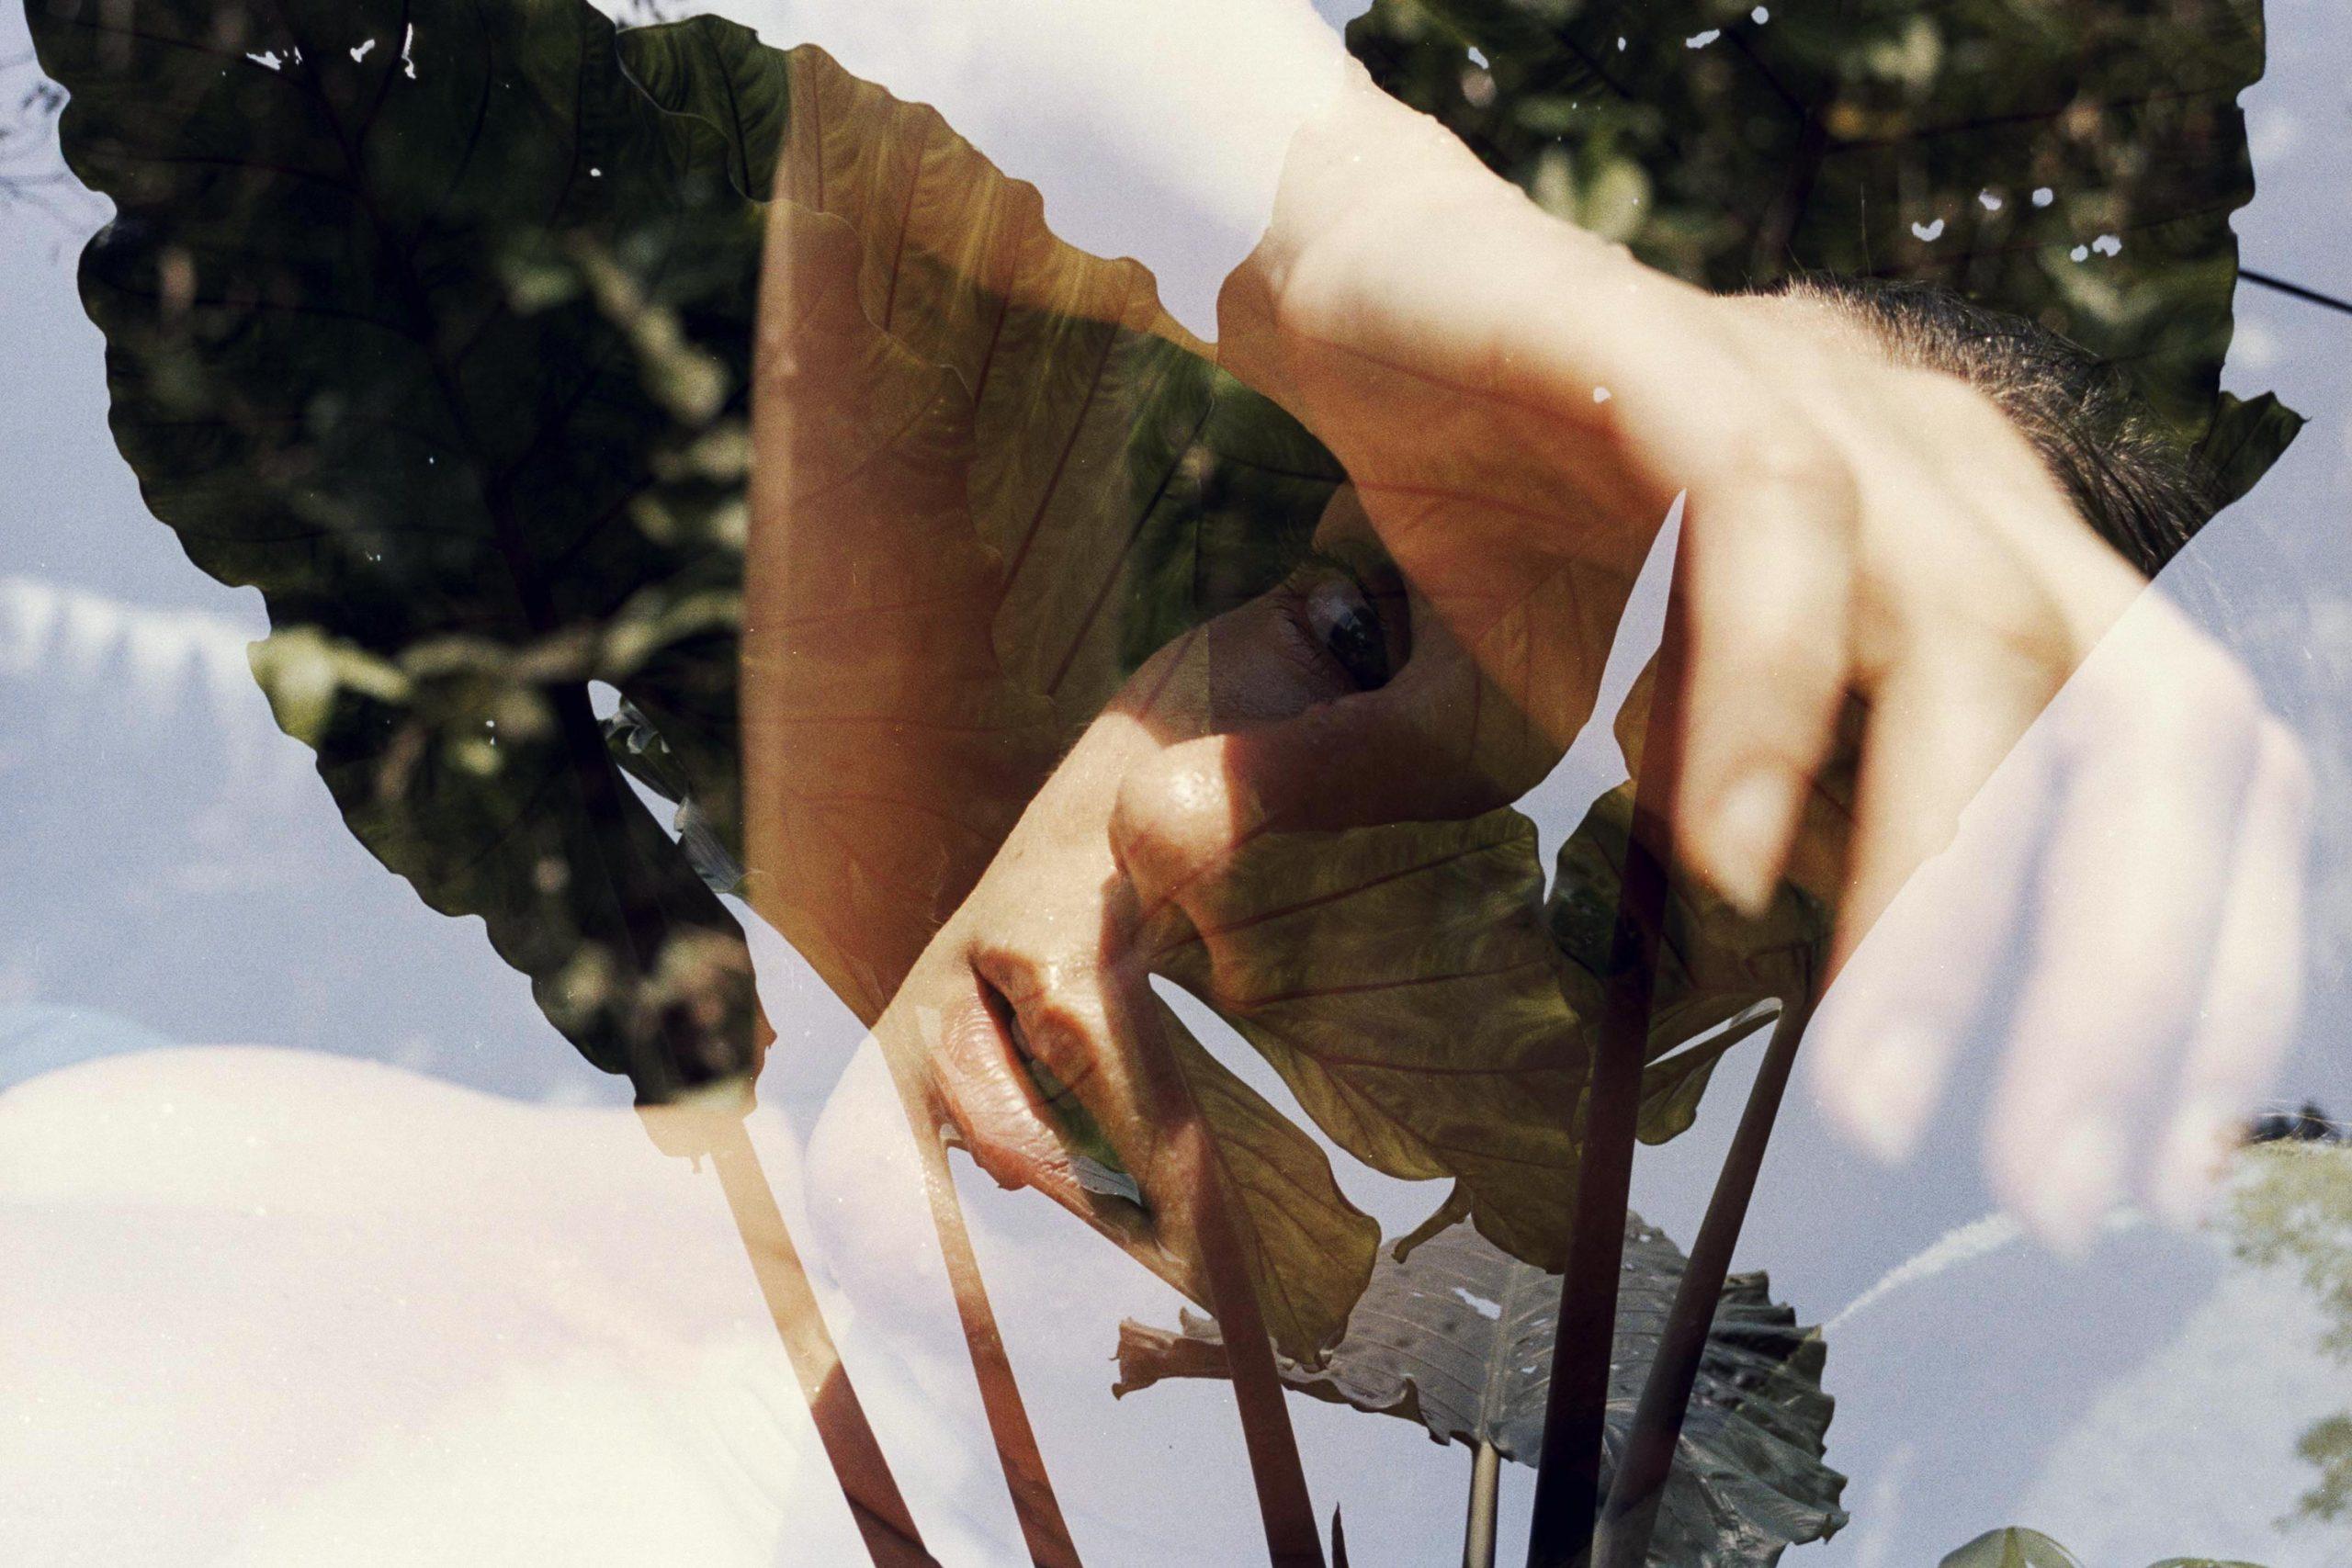 wren-agency-marcus-palmqvist-profile17